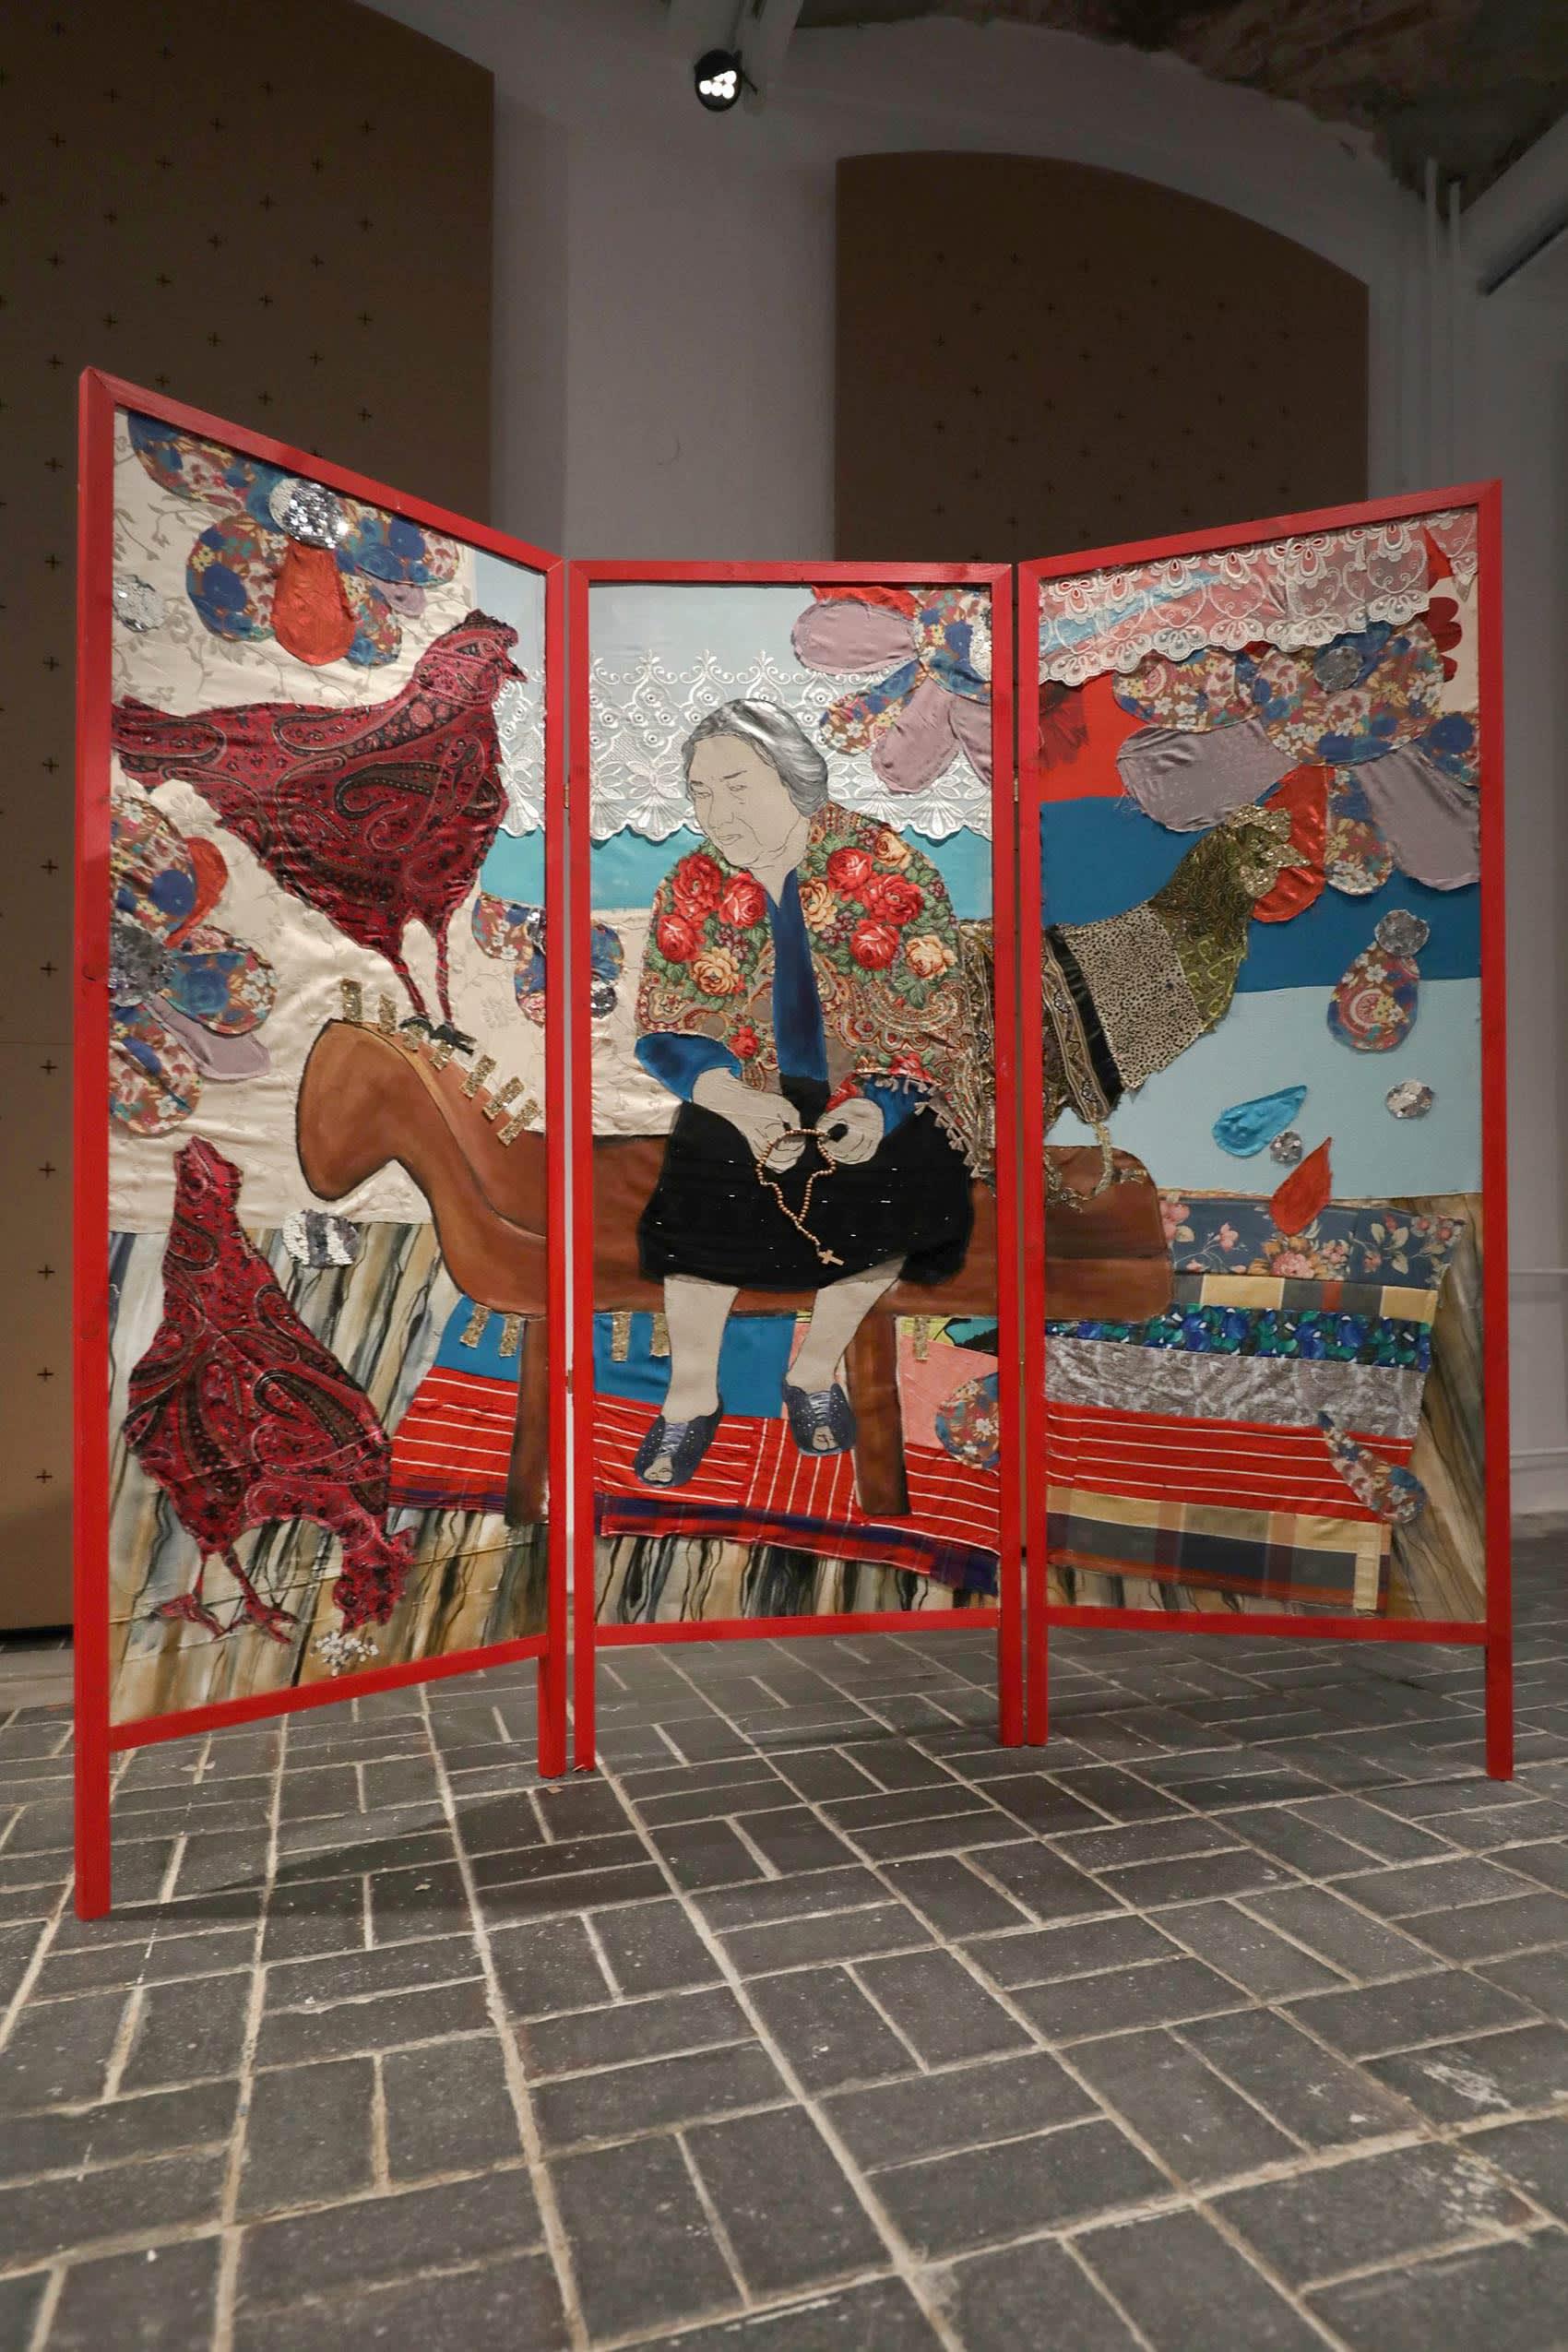 małgorzata mirga-tas, artist, lost memory, artwork, installation view